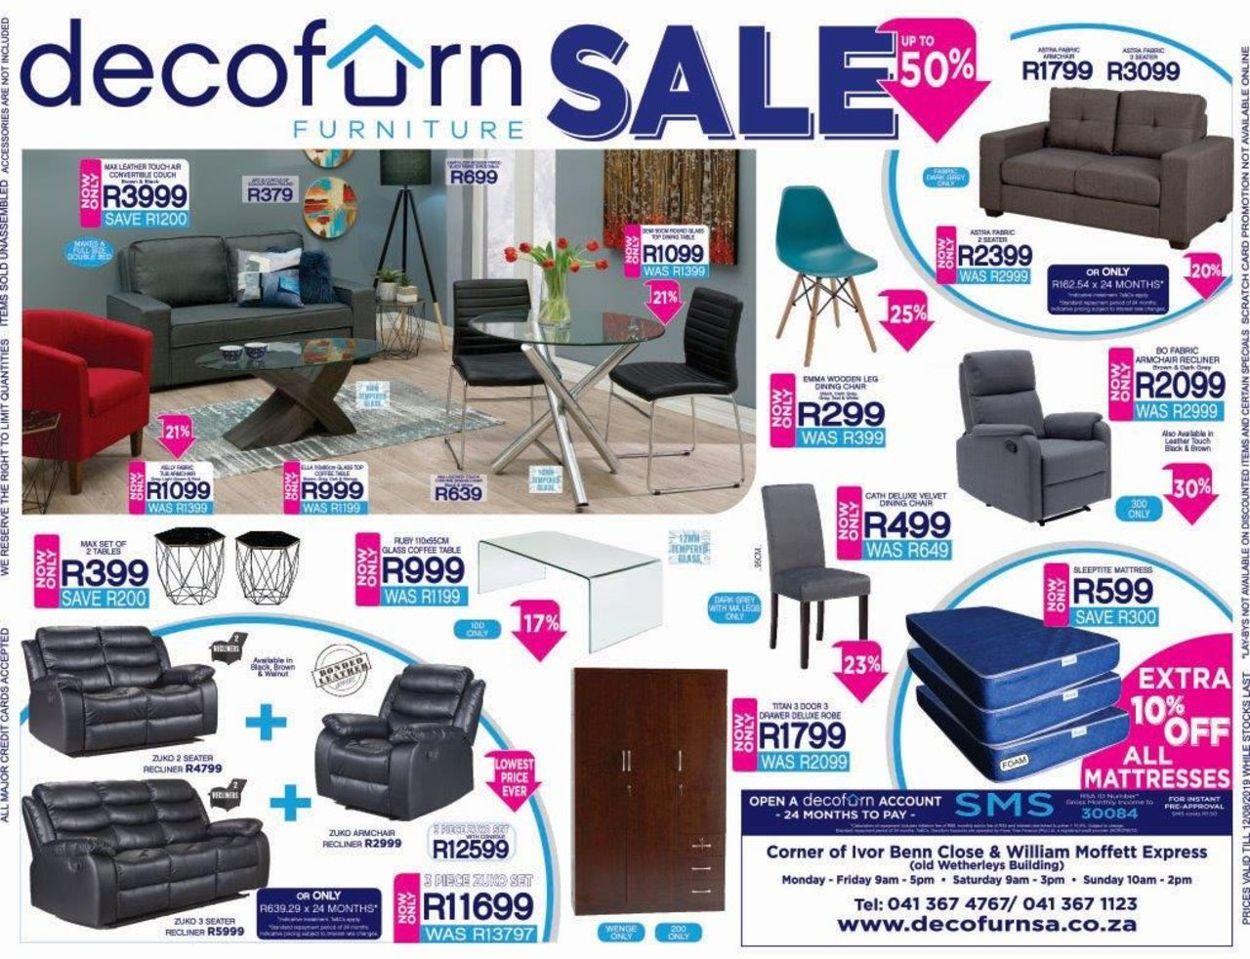 Decofurn Factory Shop Catalogue - 2019/08/07-2019/08/12